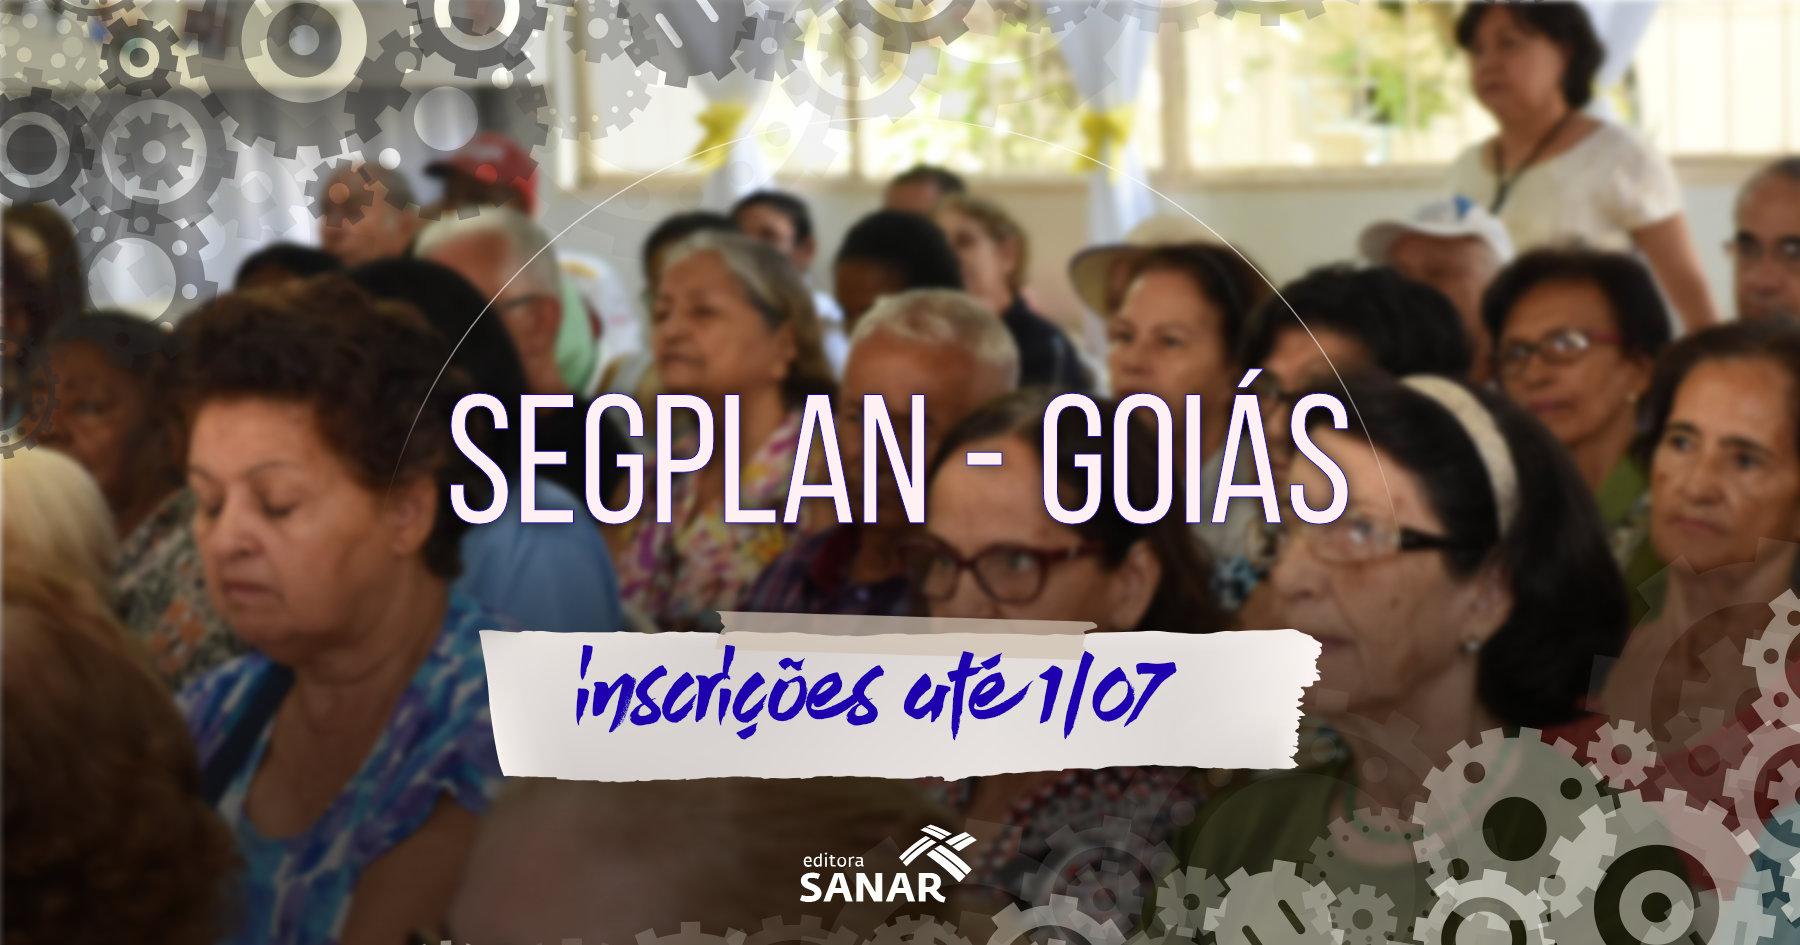 Processo Seletivo aberto pela SEGPLAN - GO tem 19 vagas